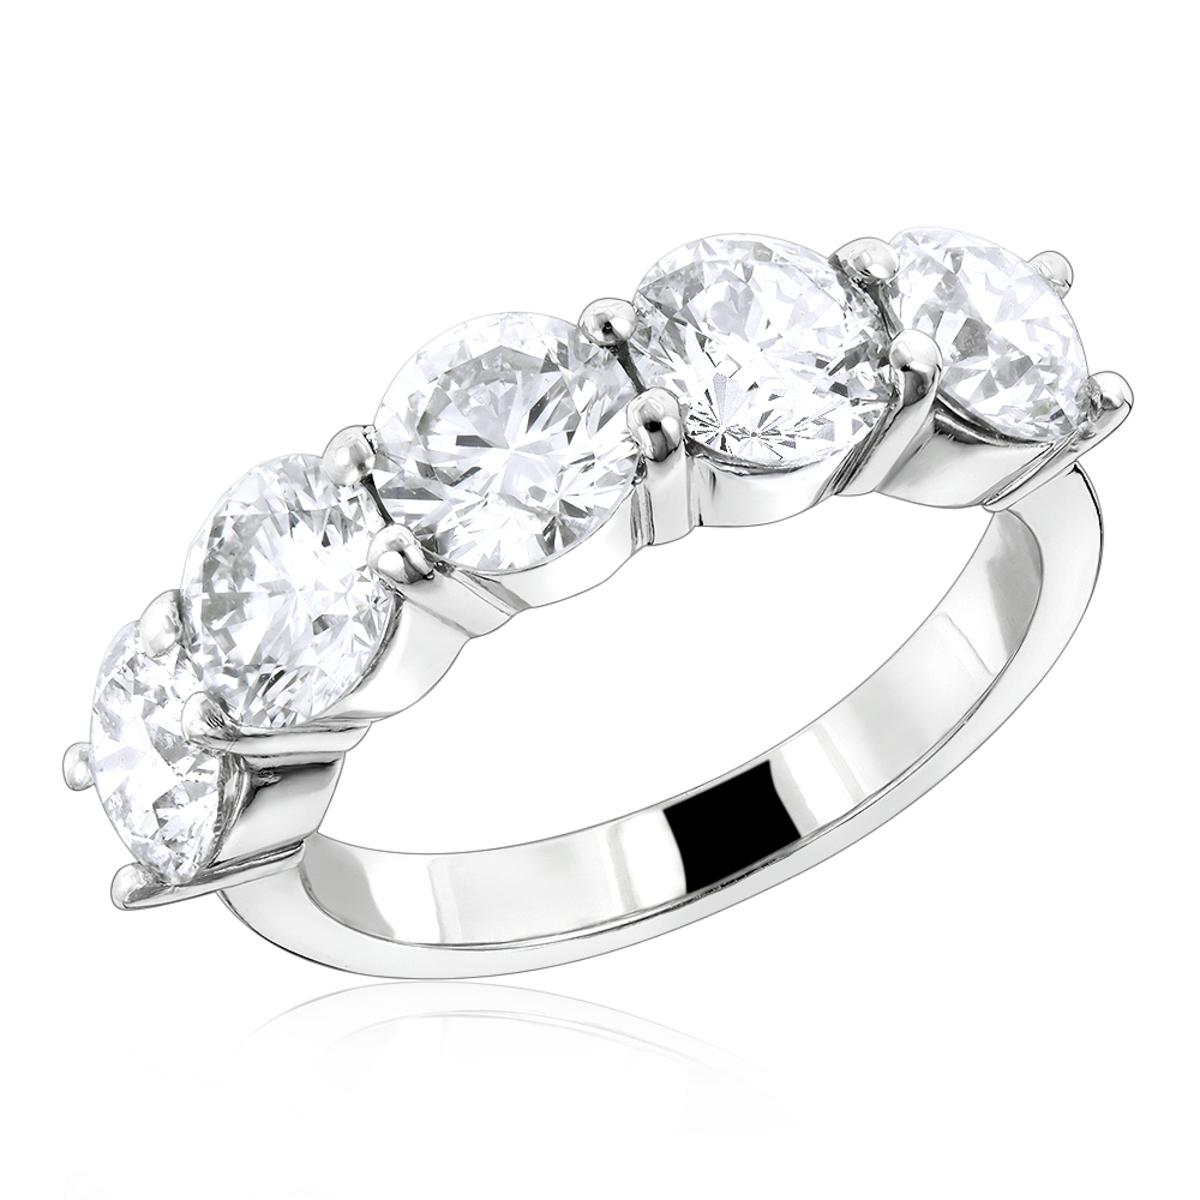 G VS Large Diamond Wedding Bands 5 Stone Anniversary Platinum Ring